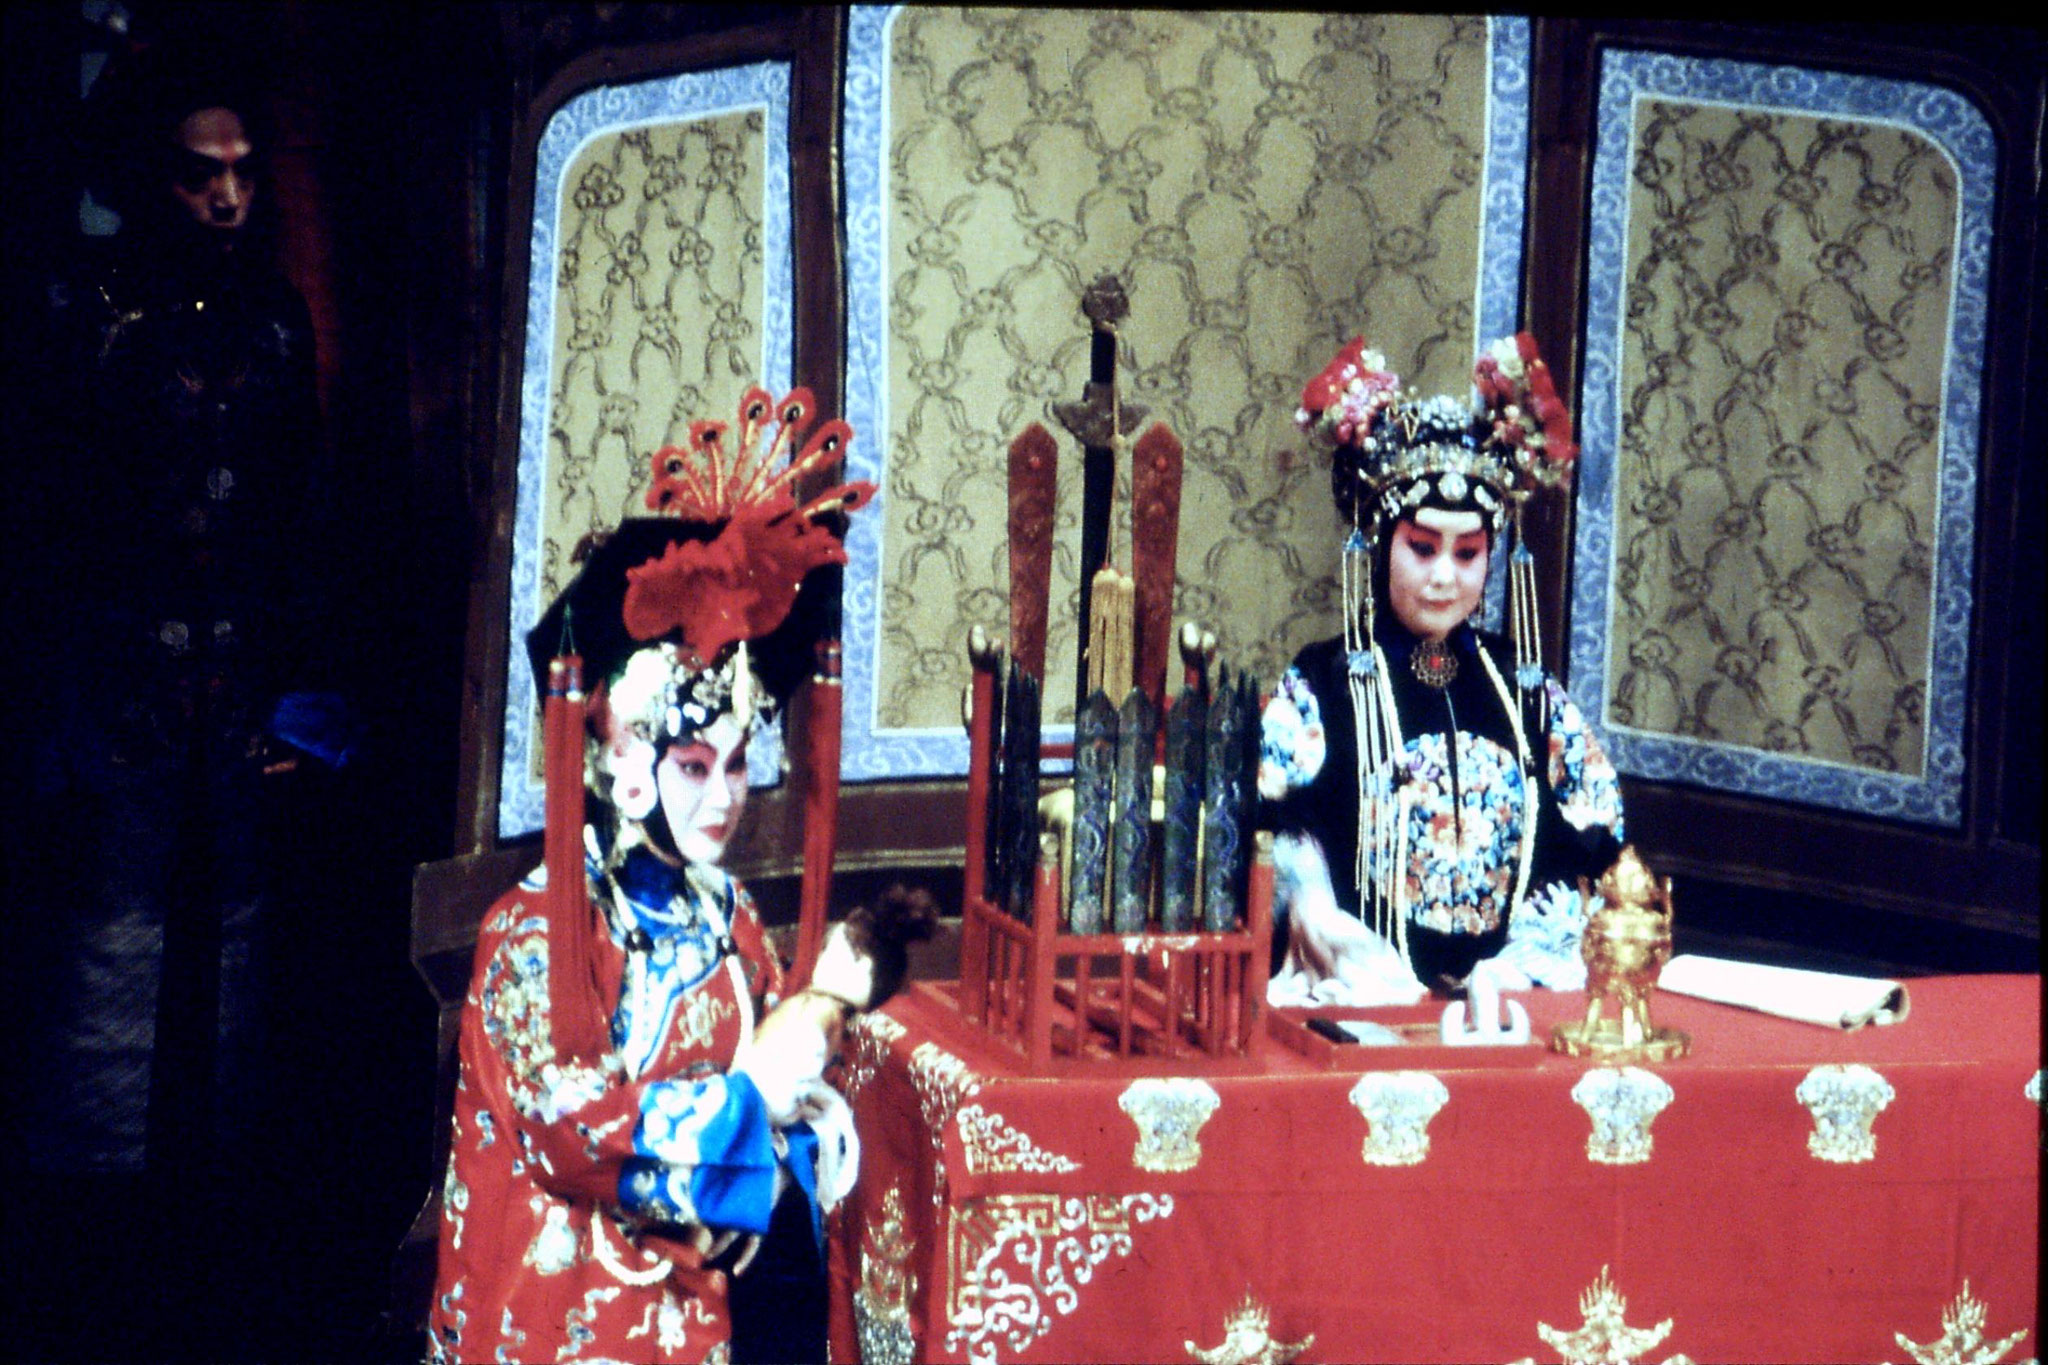 17/3/1989: 11: Chang'an opera